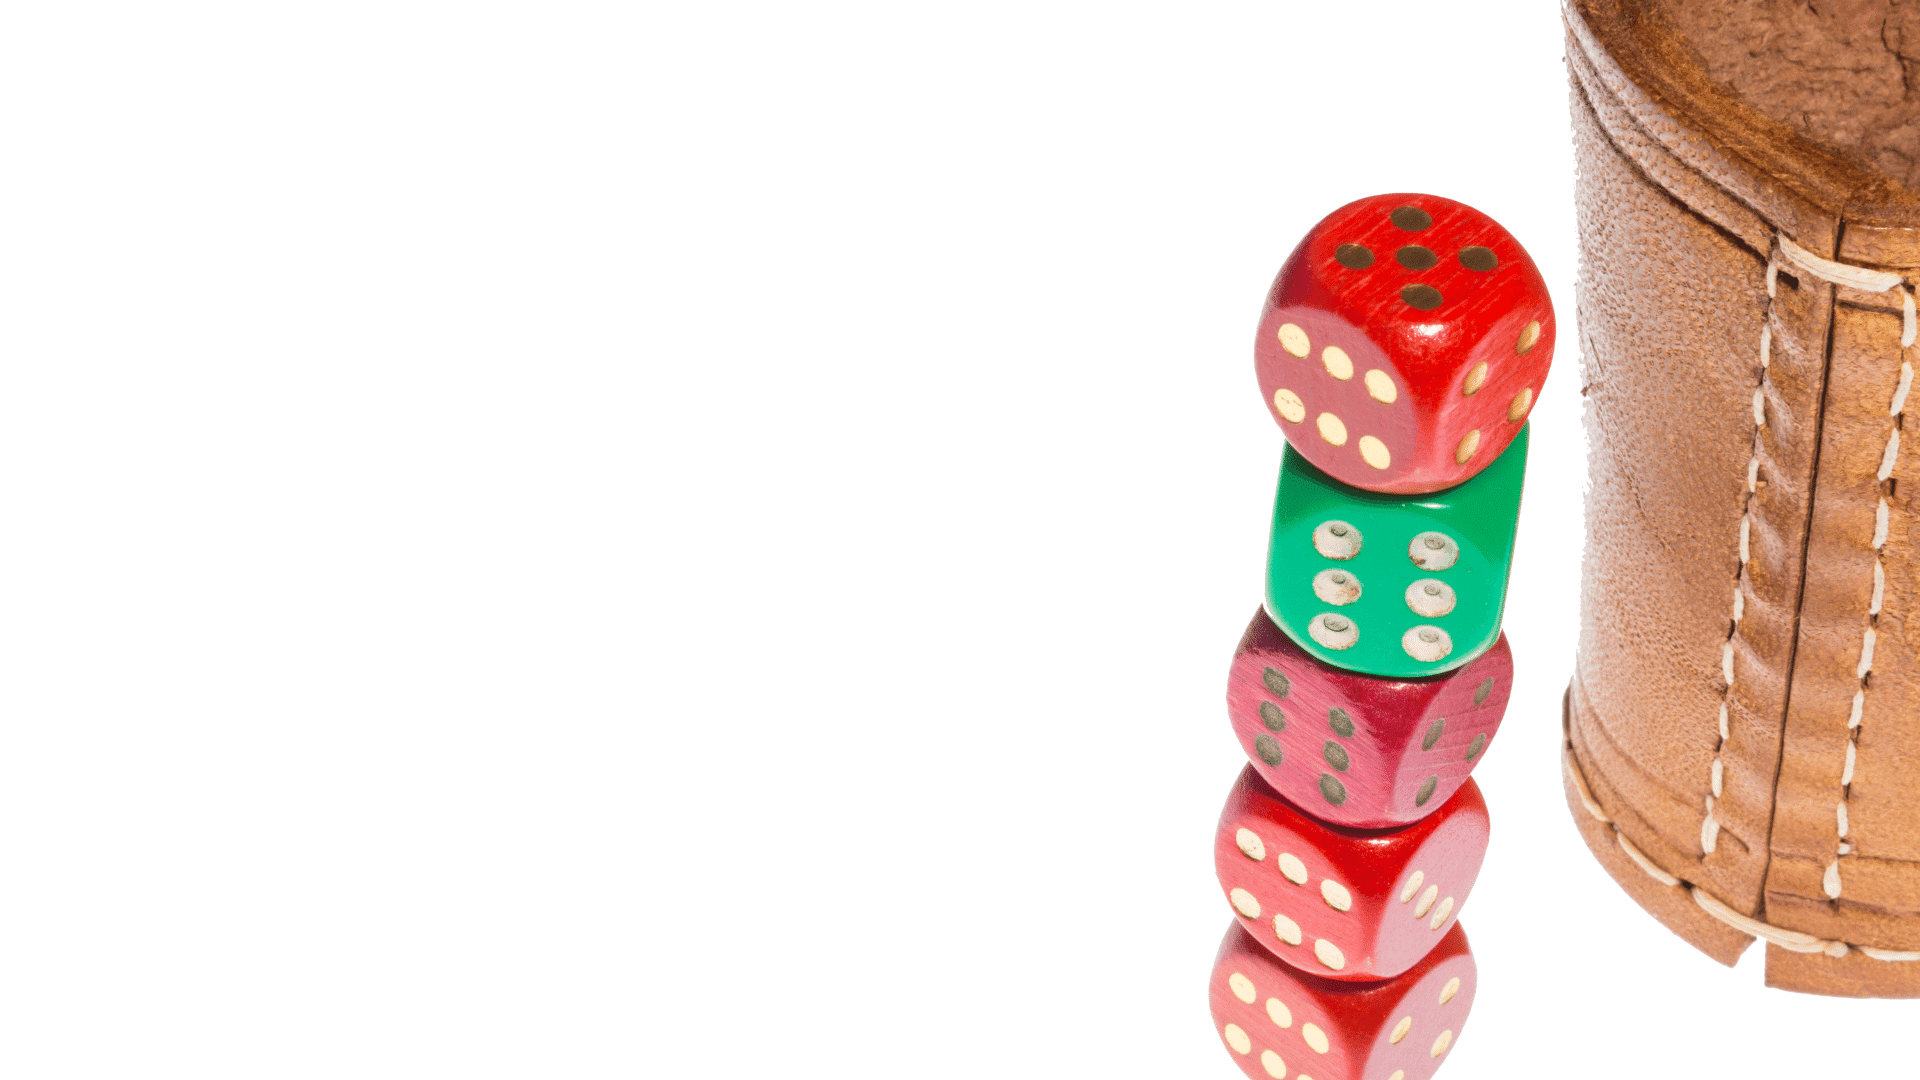 Crapless 掷骰子:掷骰子的新面貌